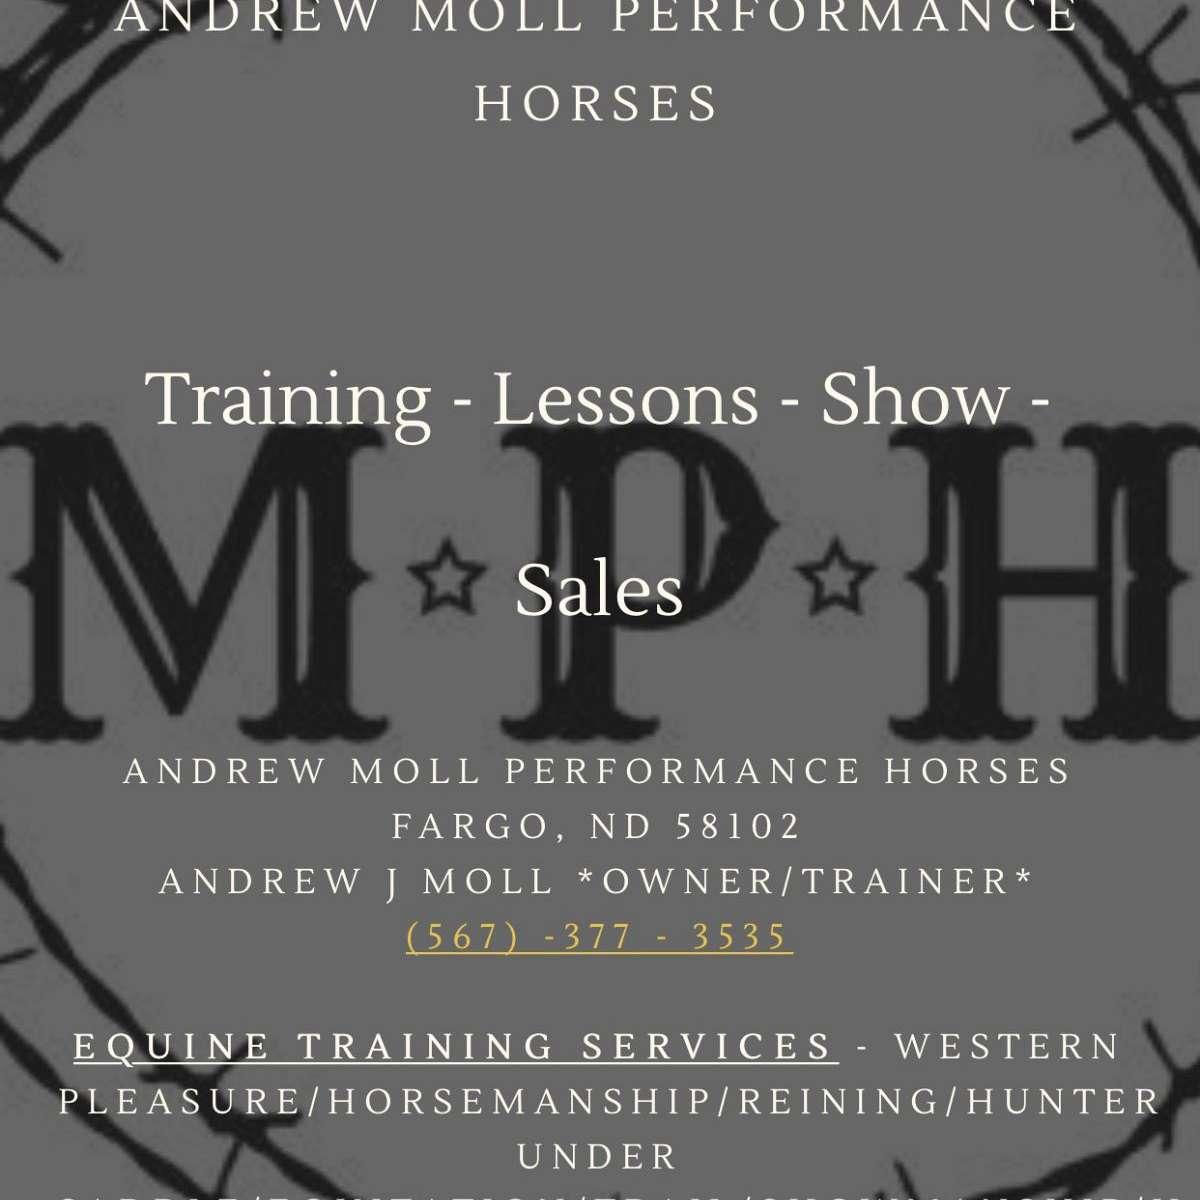 Andrew Moll Performance Horses